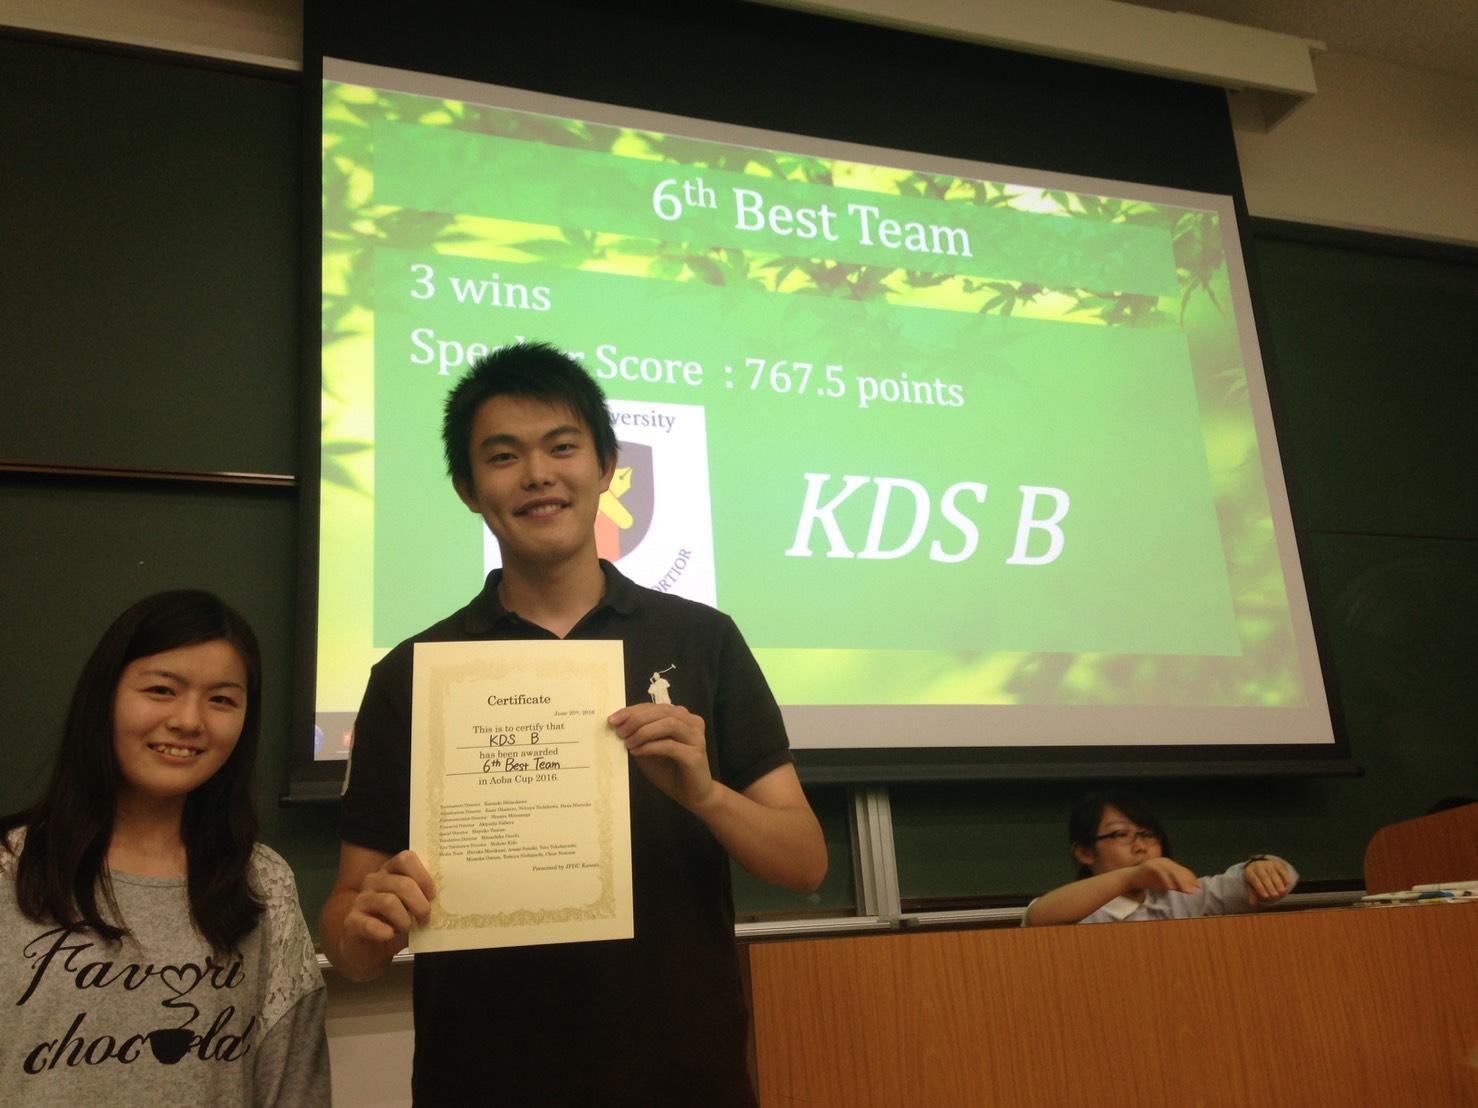 KDS b